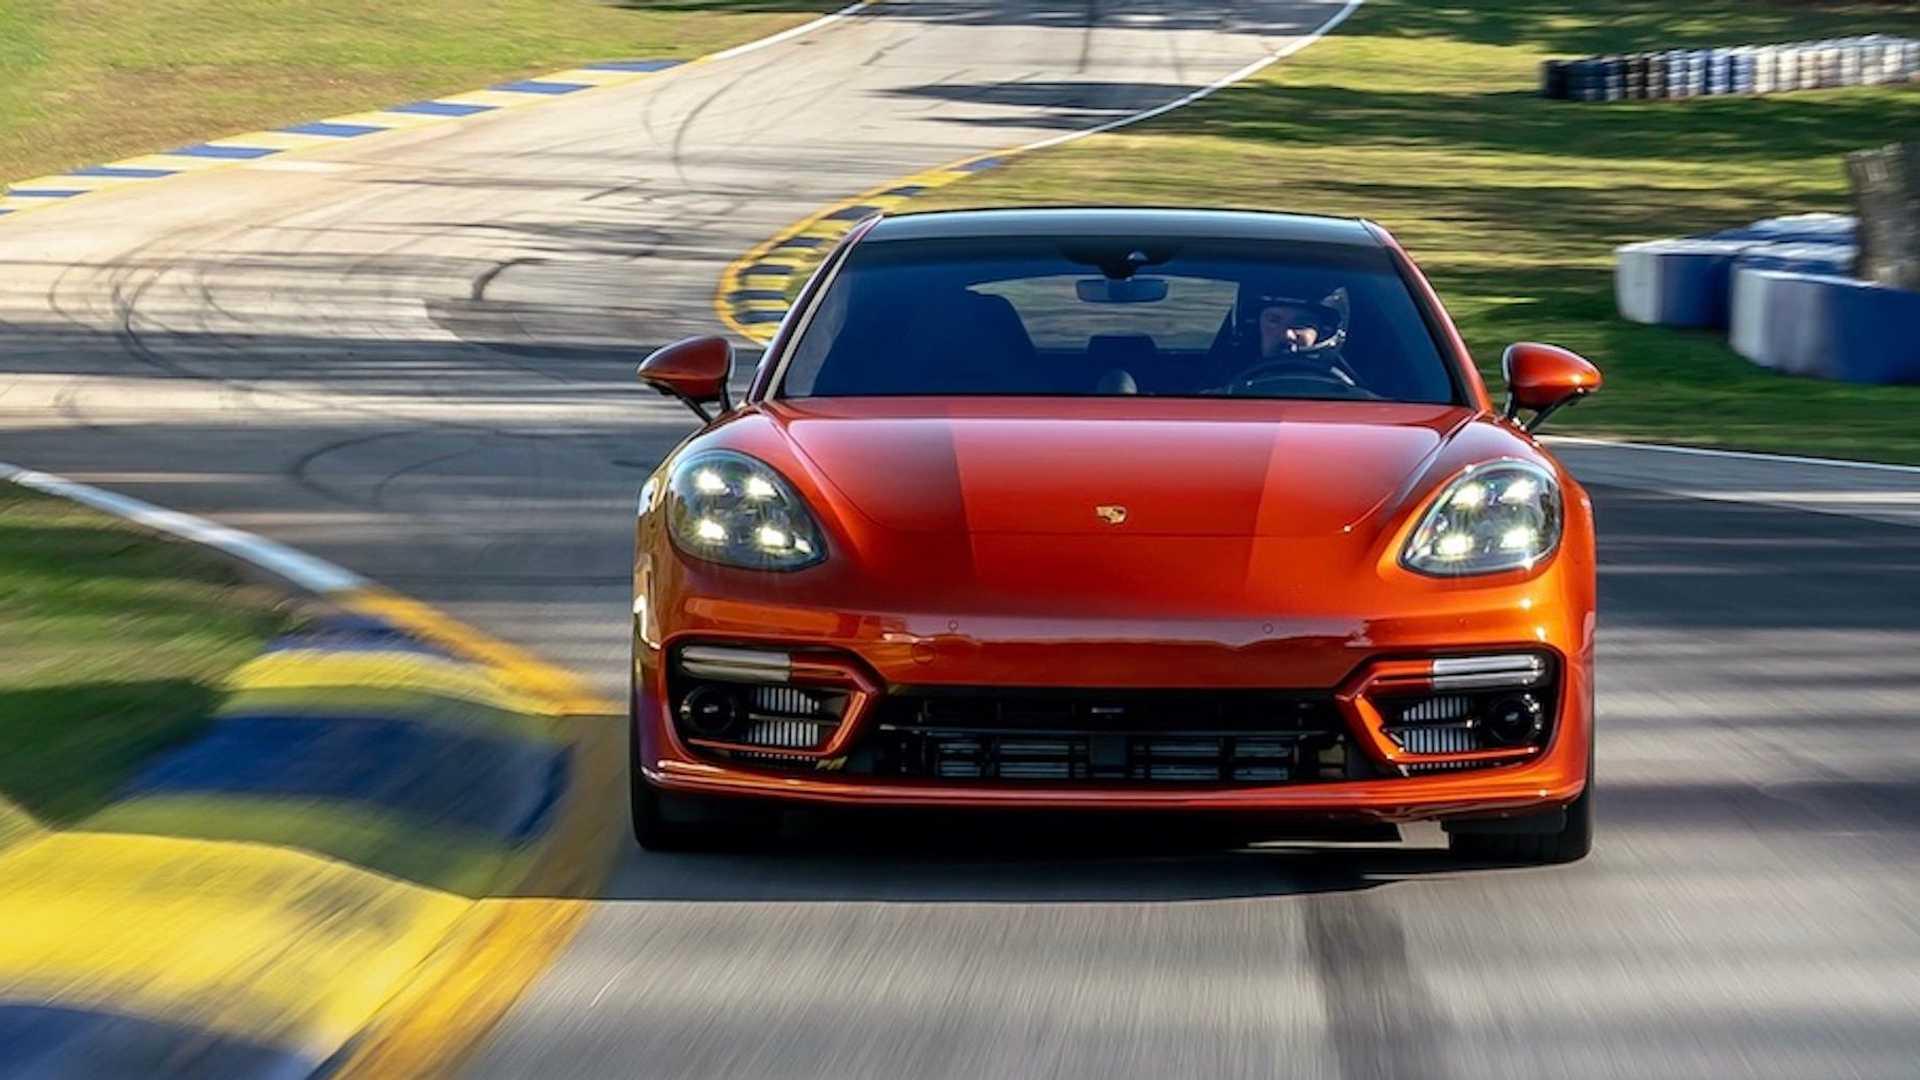 Porsche-Panamera-Turbo-Record-Road-Atlanta-3